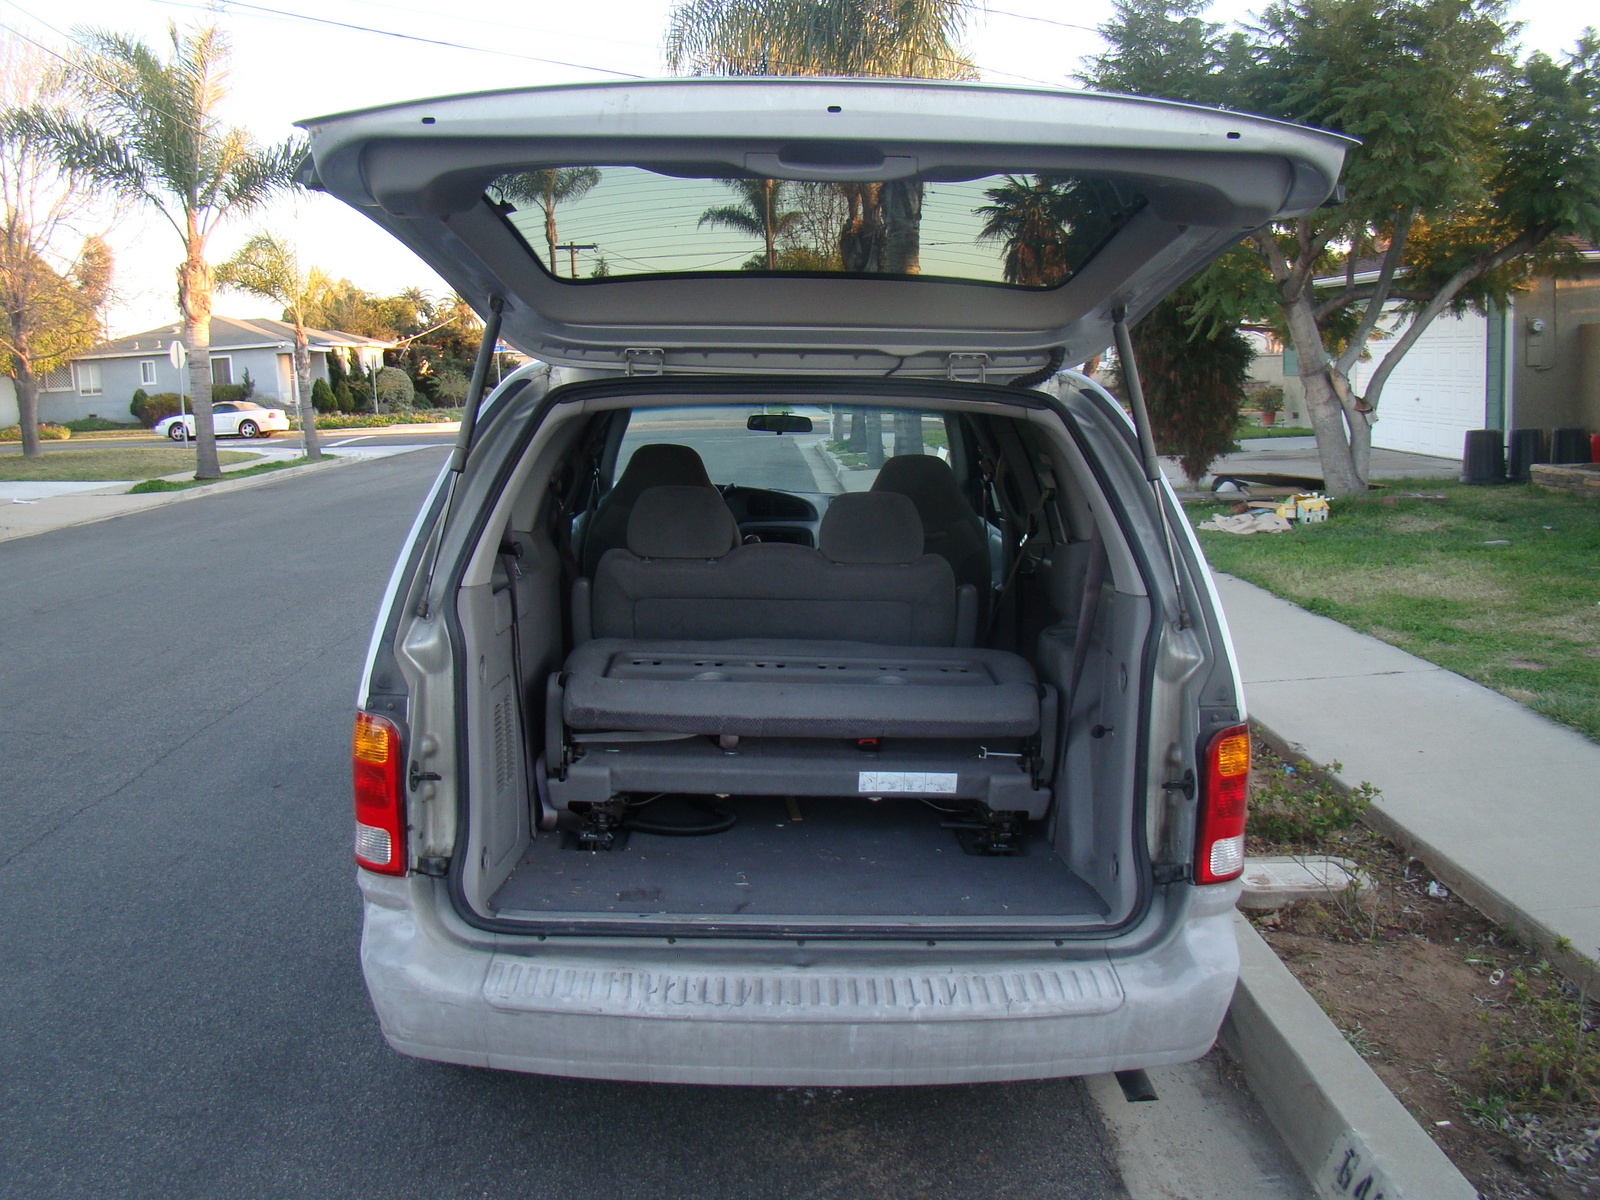 2000 ford windstar interior pictures cargurus